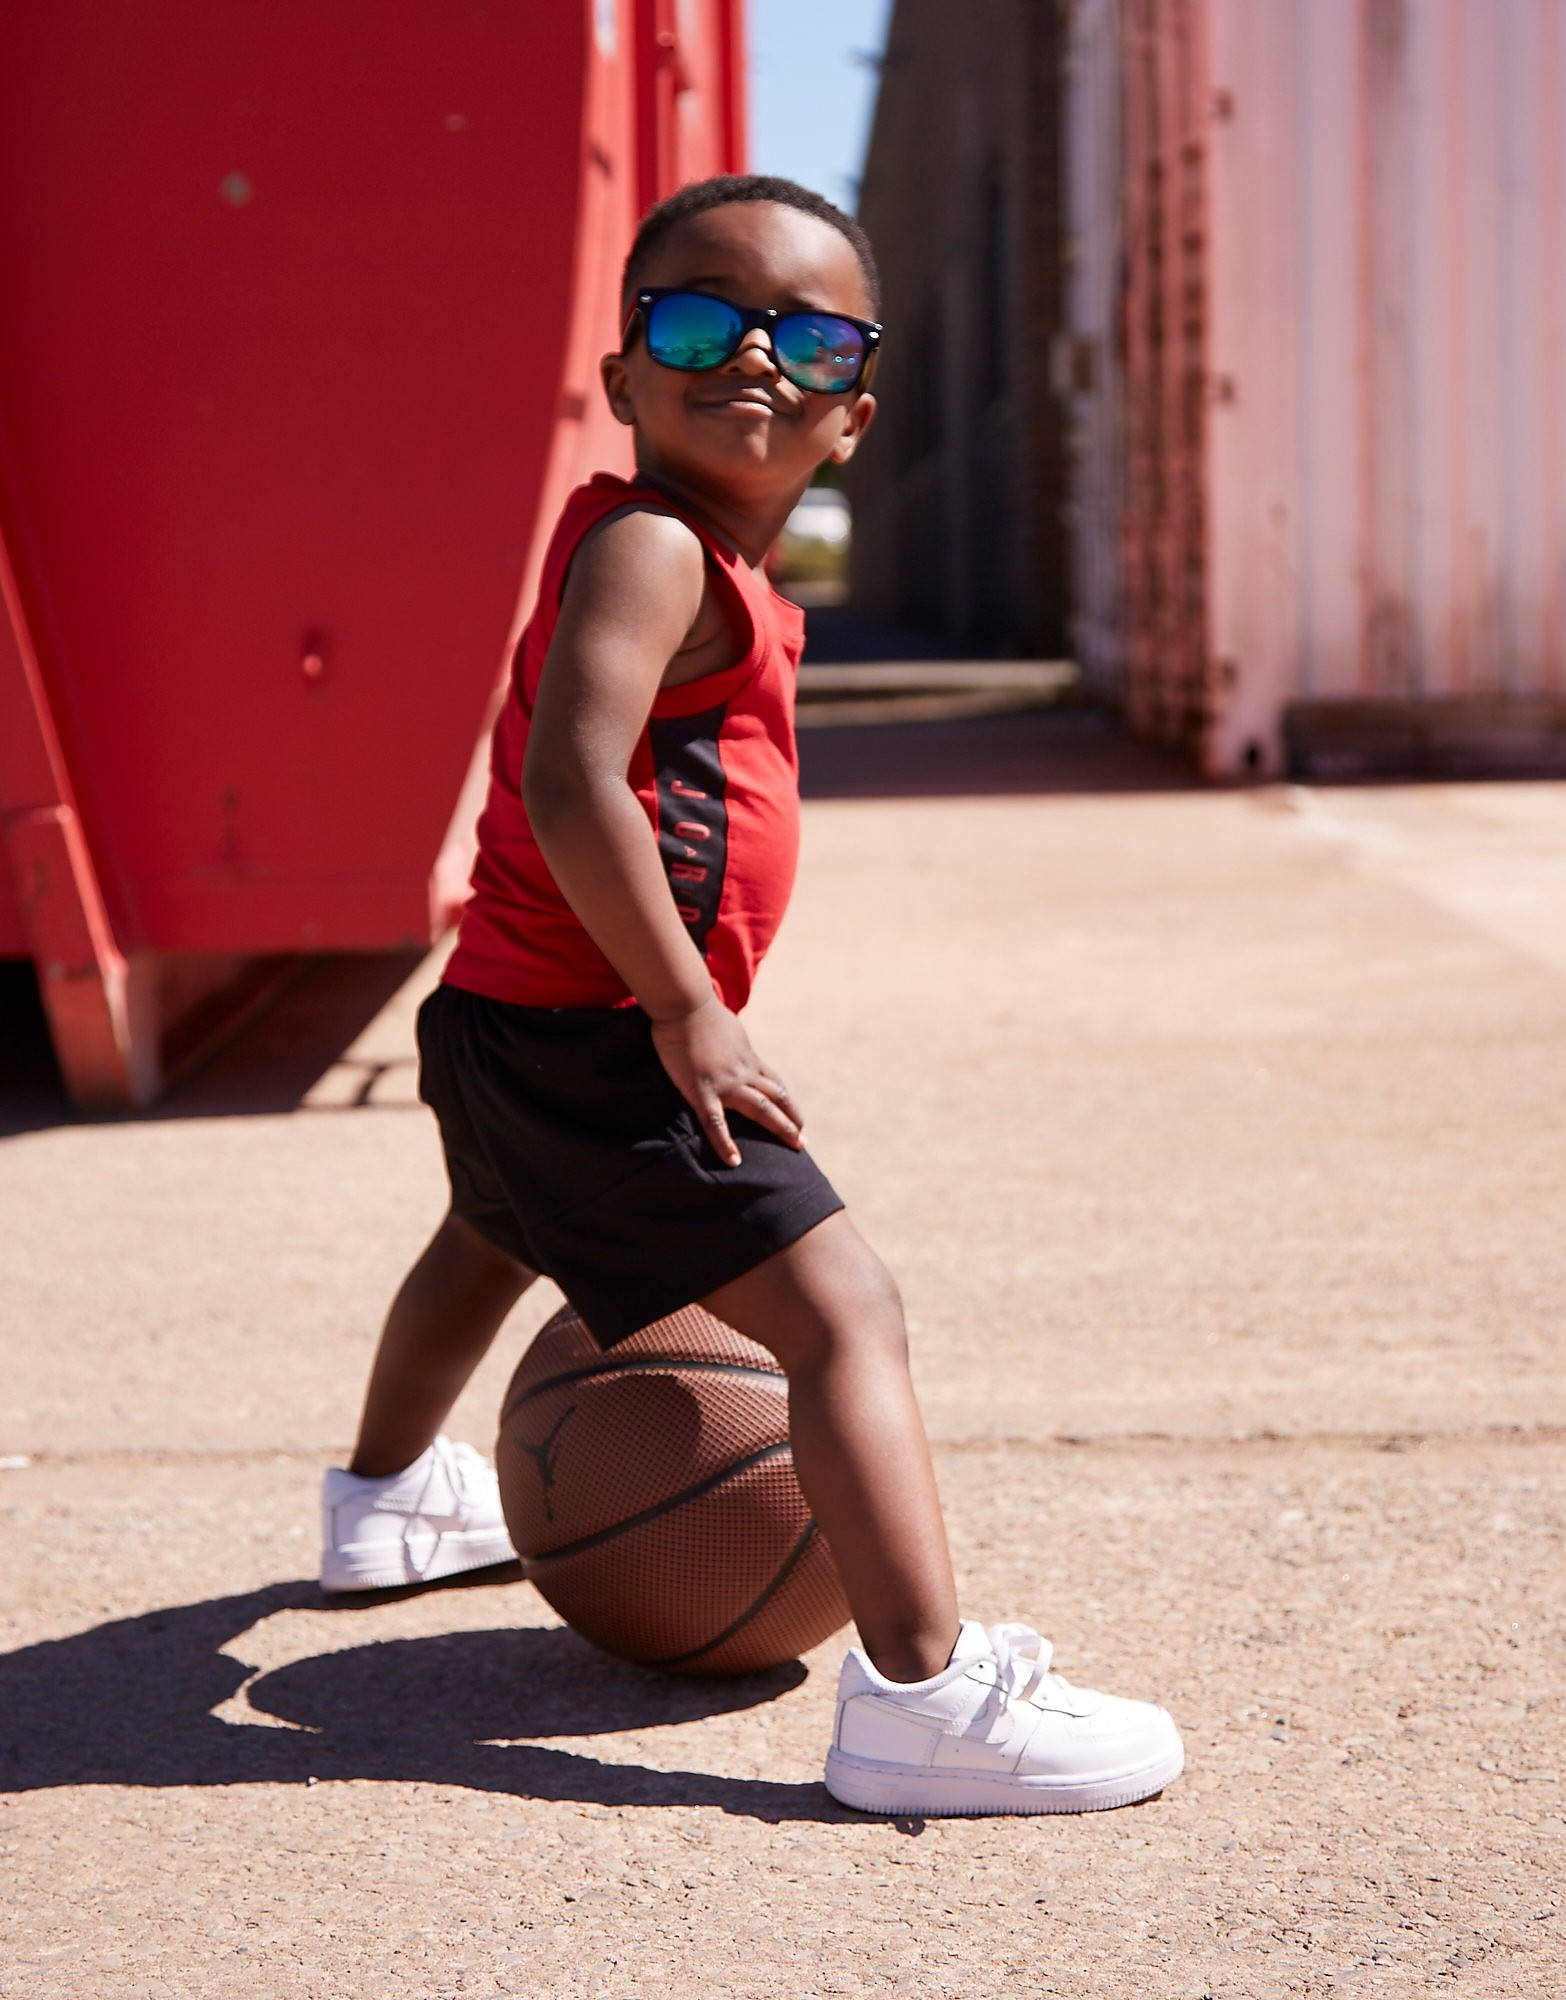 Jordan Air 23 Rise Basketball Set Infant